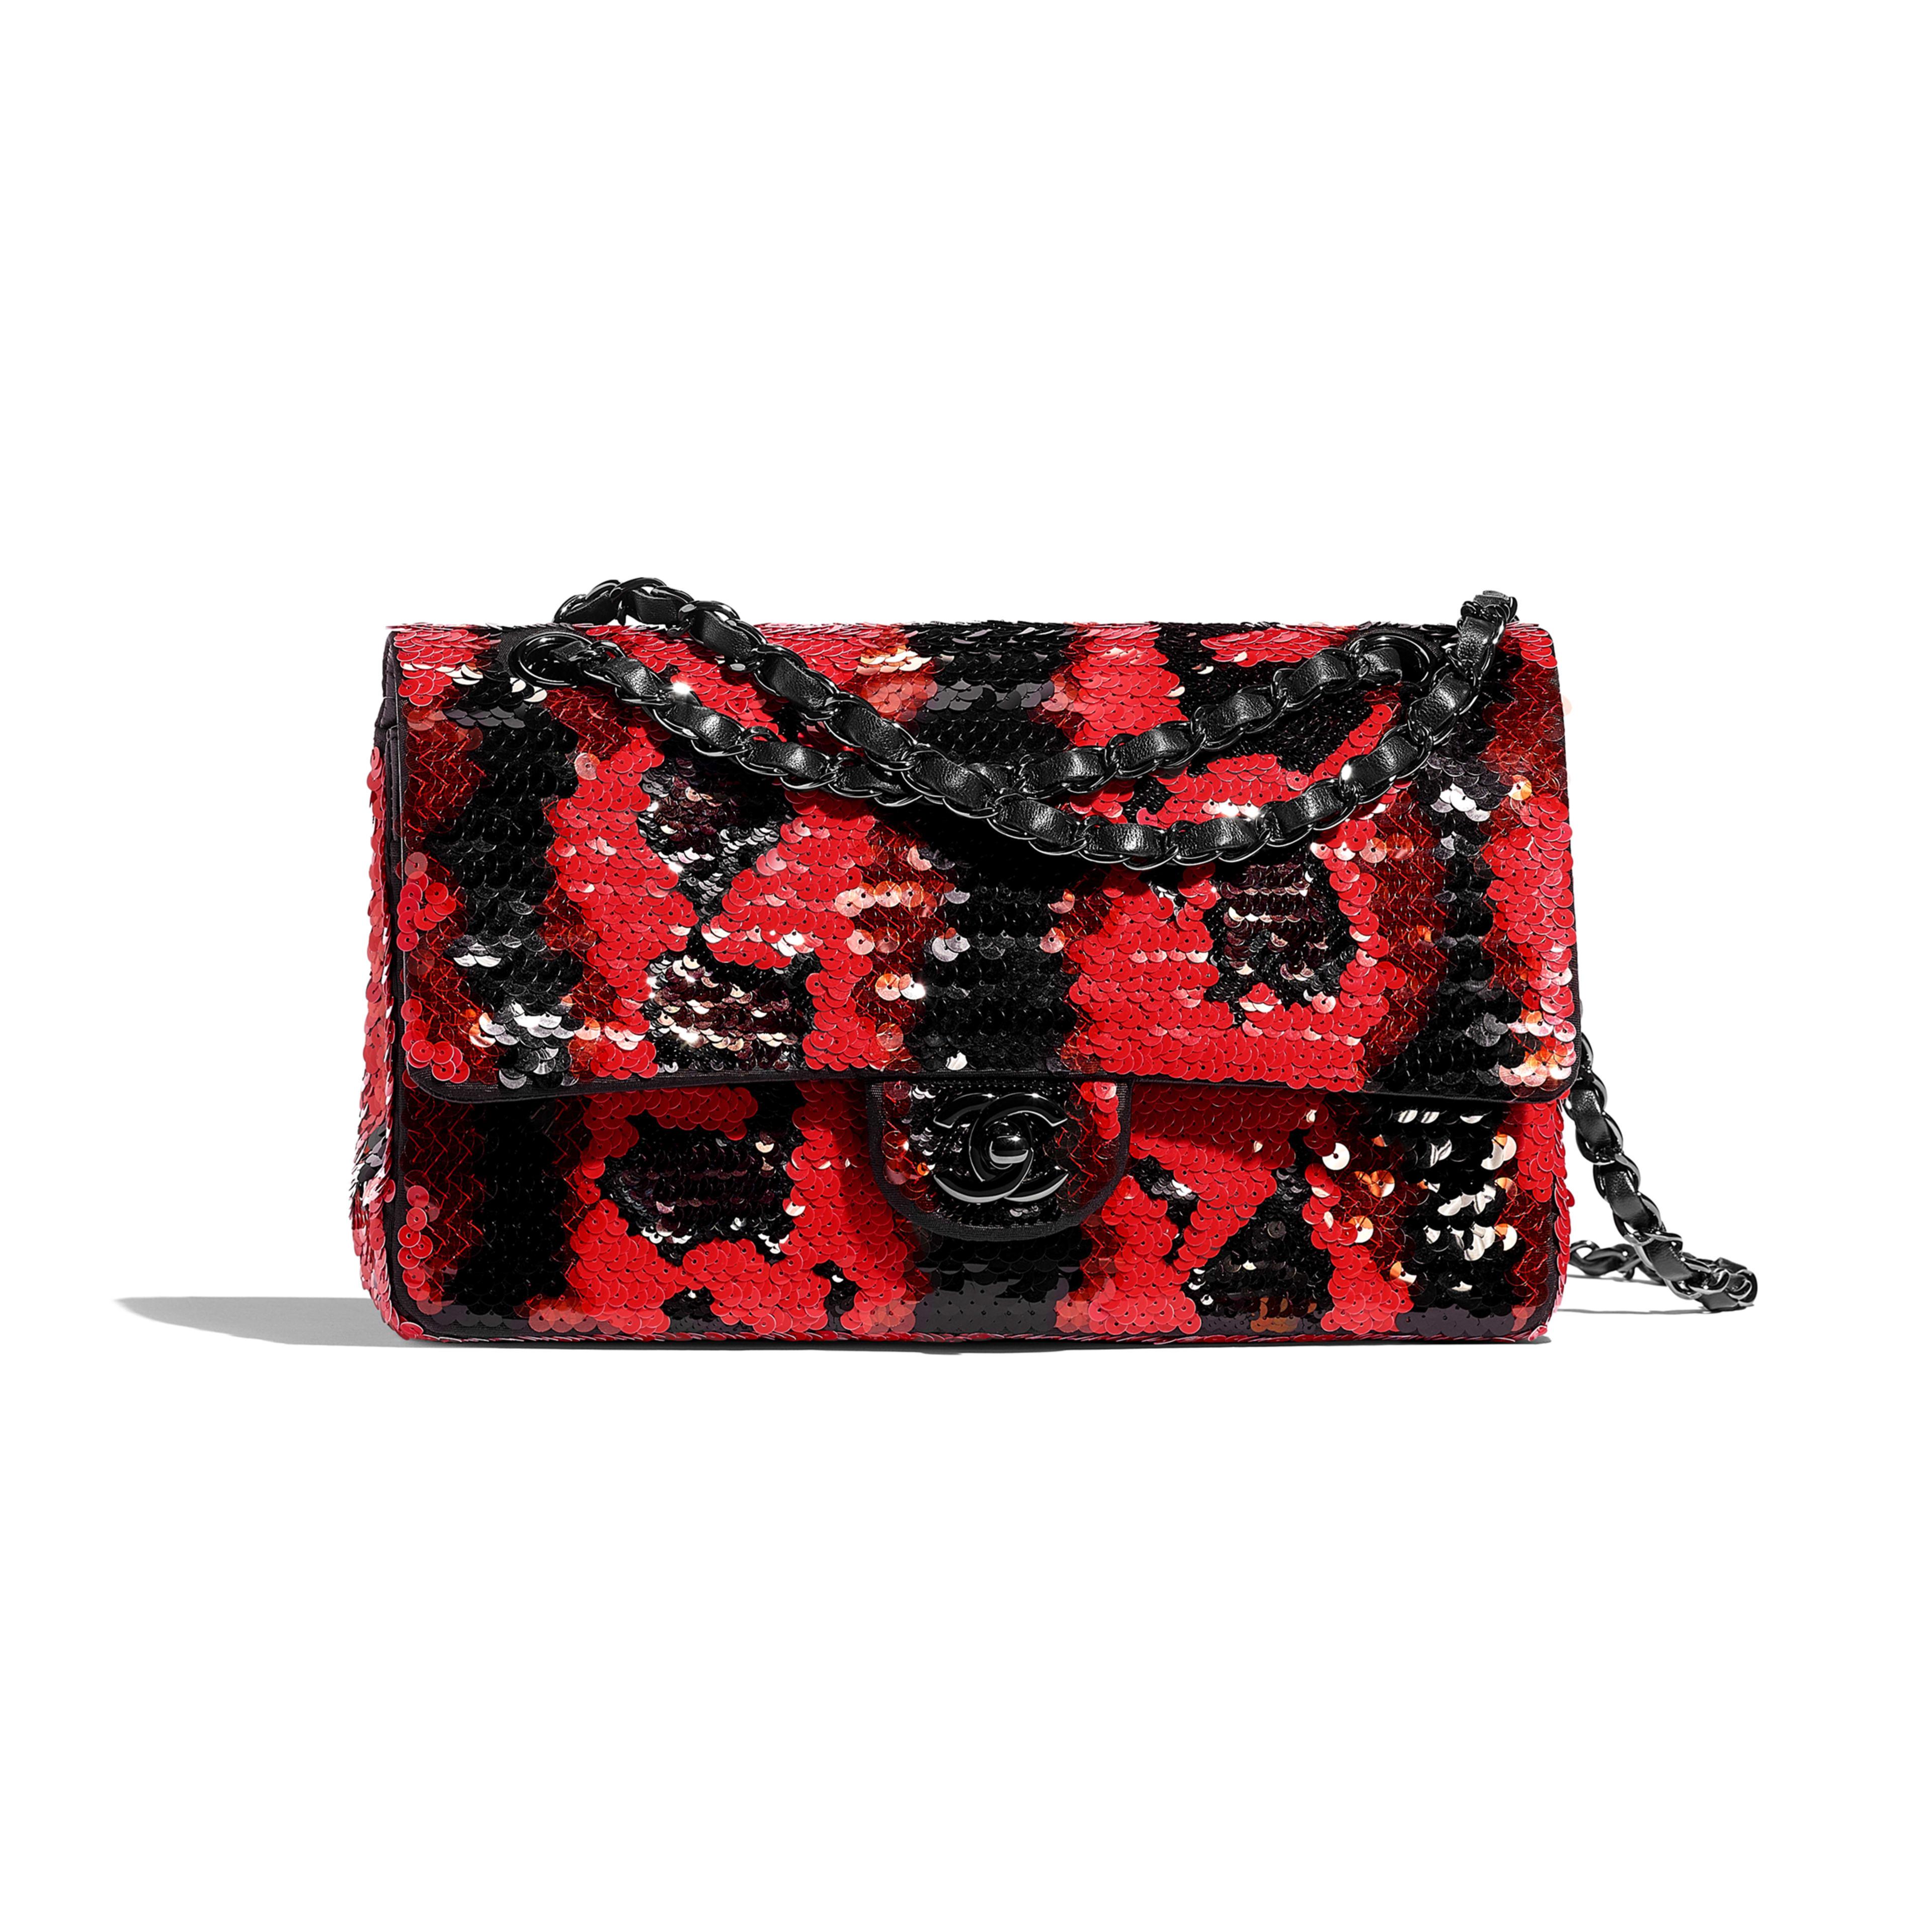 Classic Handbag - Red & Black - Sequins & Black Metal - Default view - see full sized version